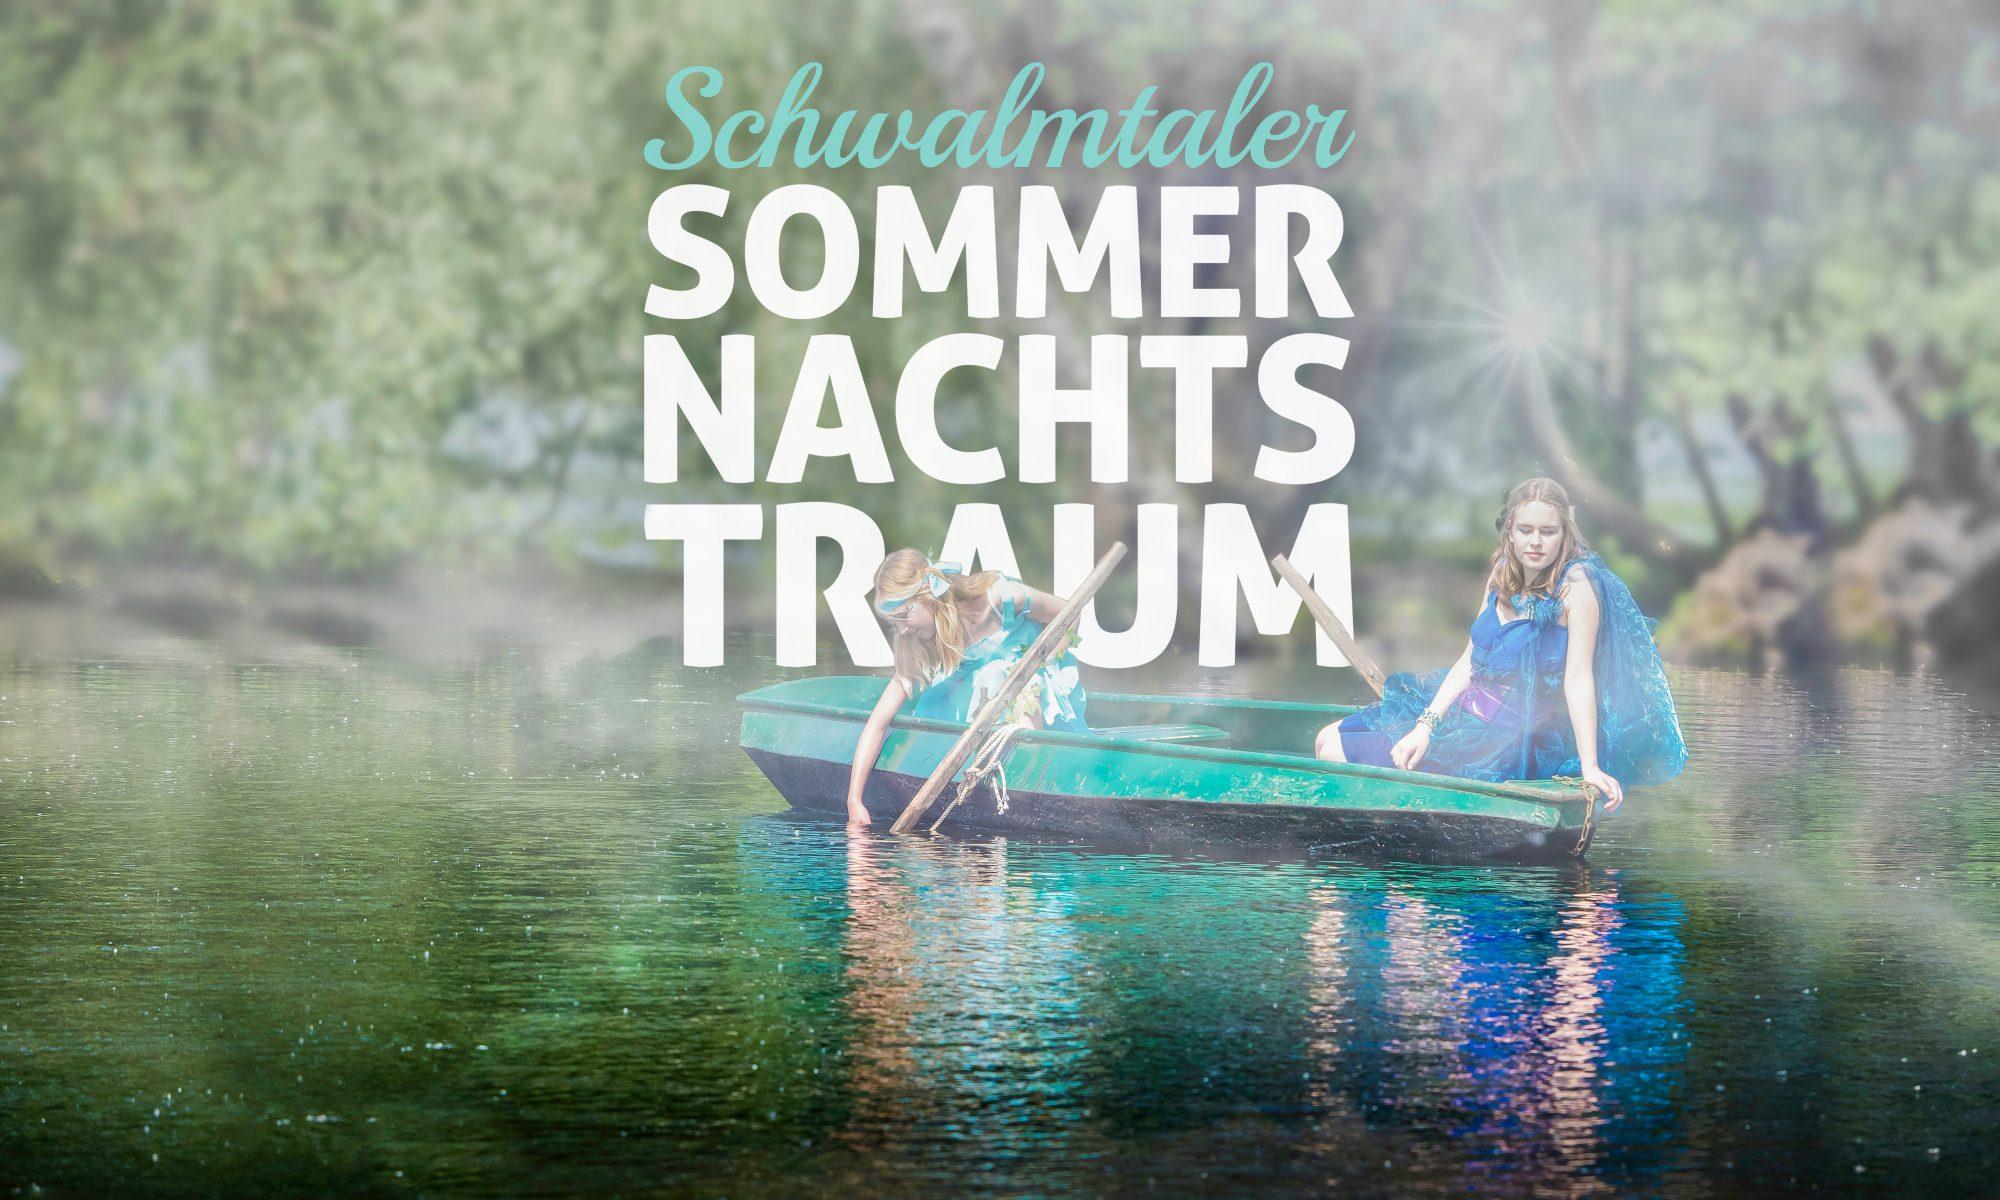 Schwalmtaler Sommernachtstraum